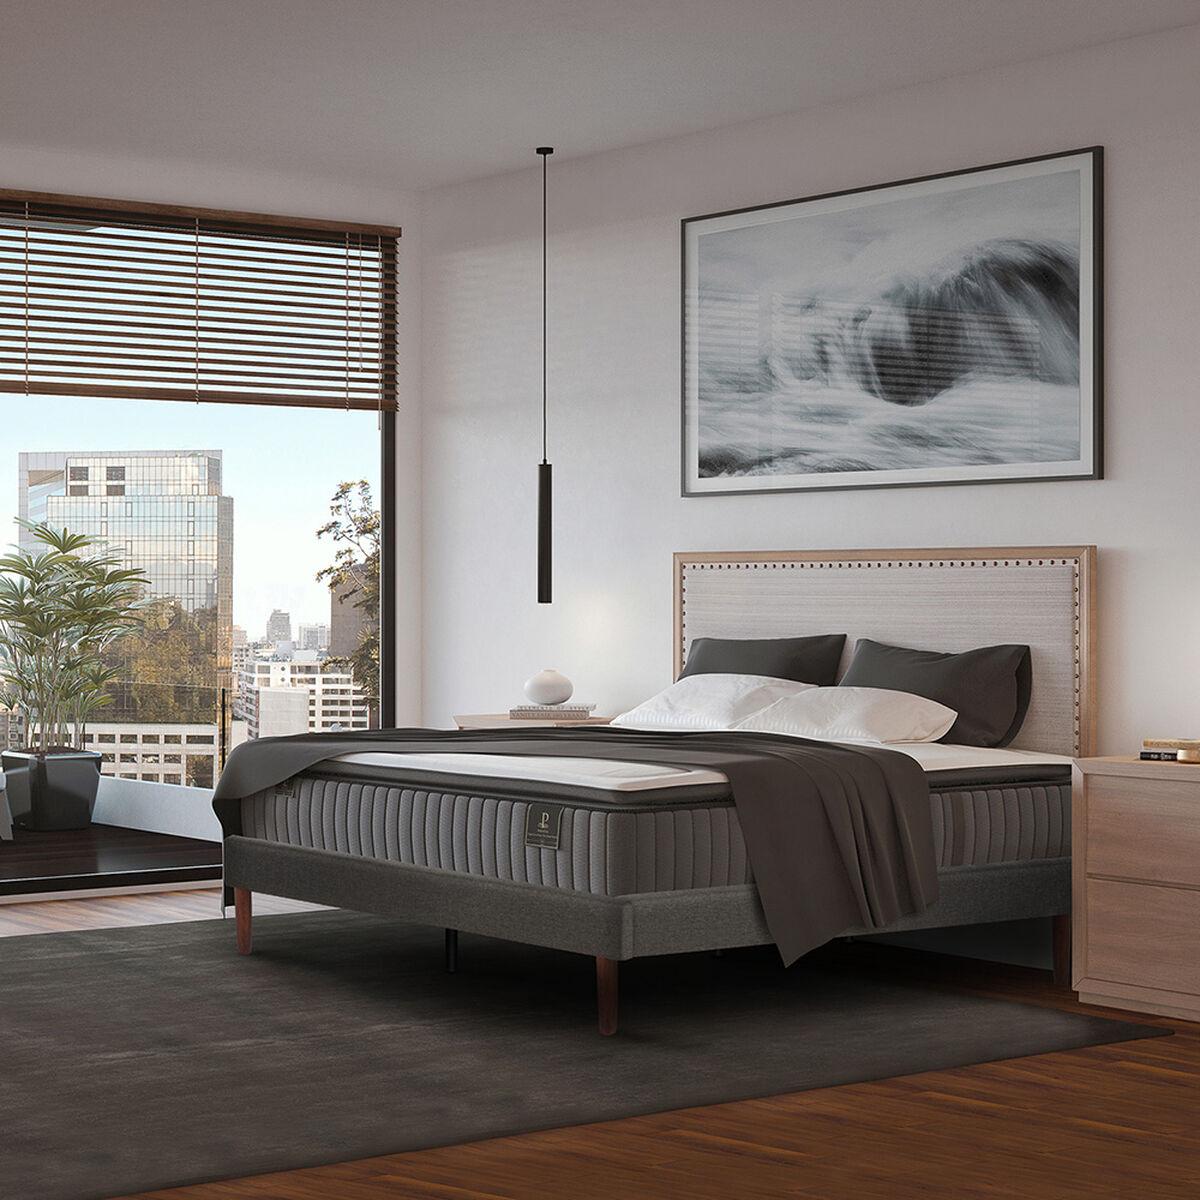 Cama Europea CIC 2 Plazas Curve Premium + Set Textil